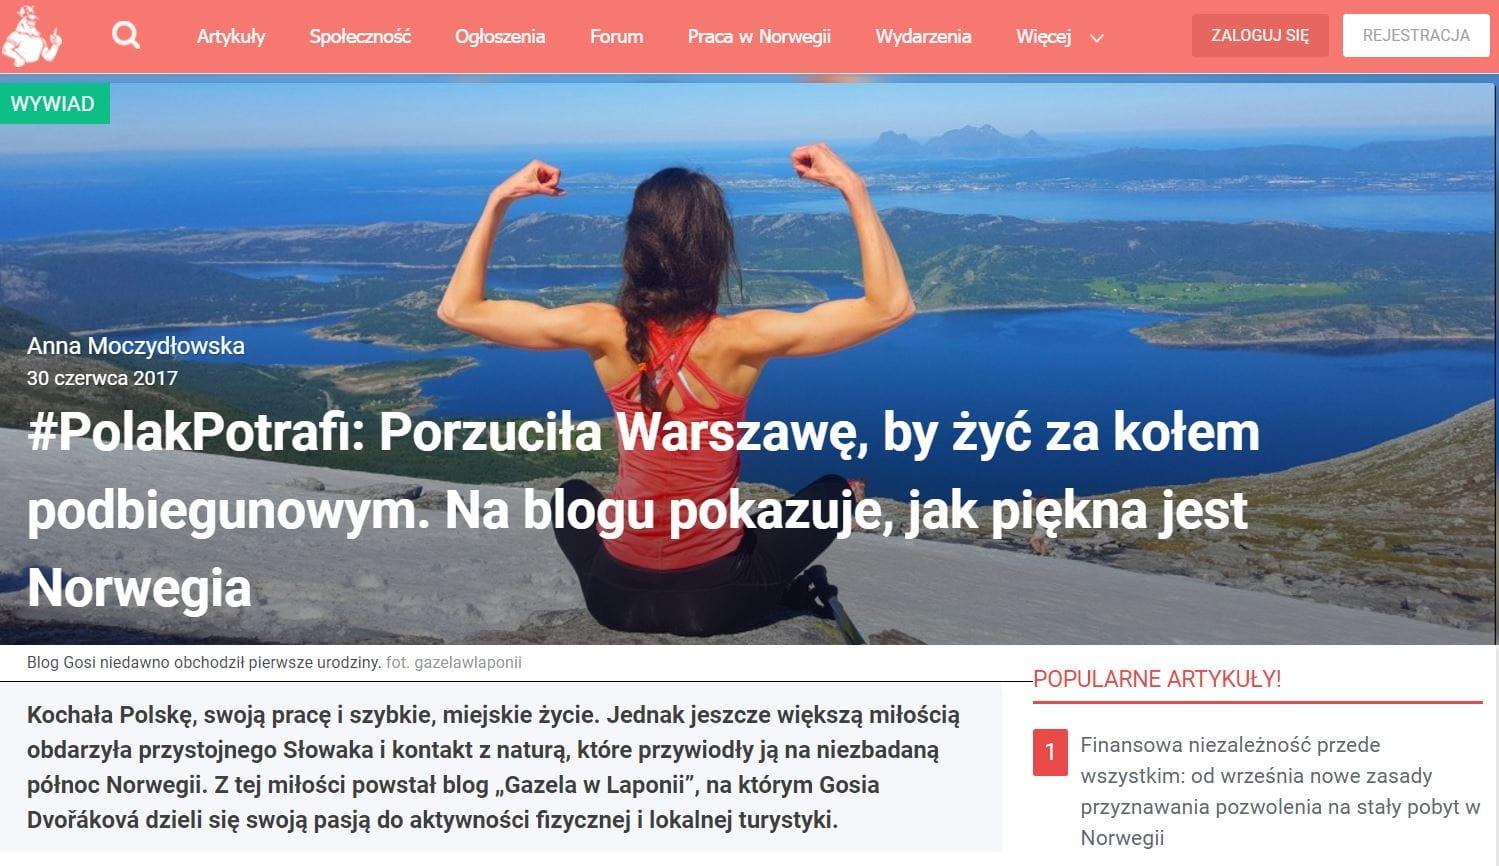 MojaNorwegia.pl: #PolakPotrafi